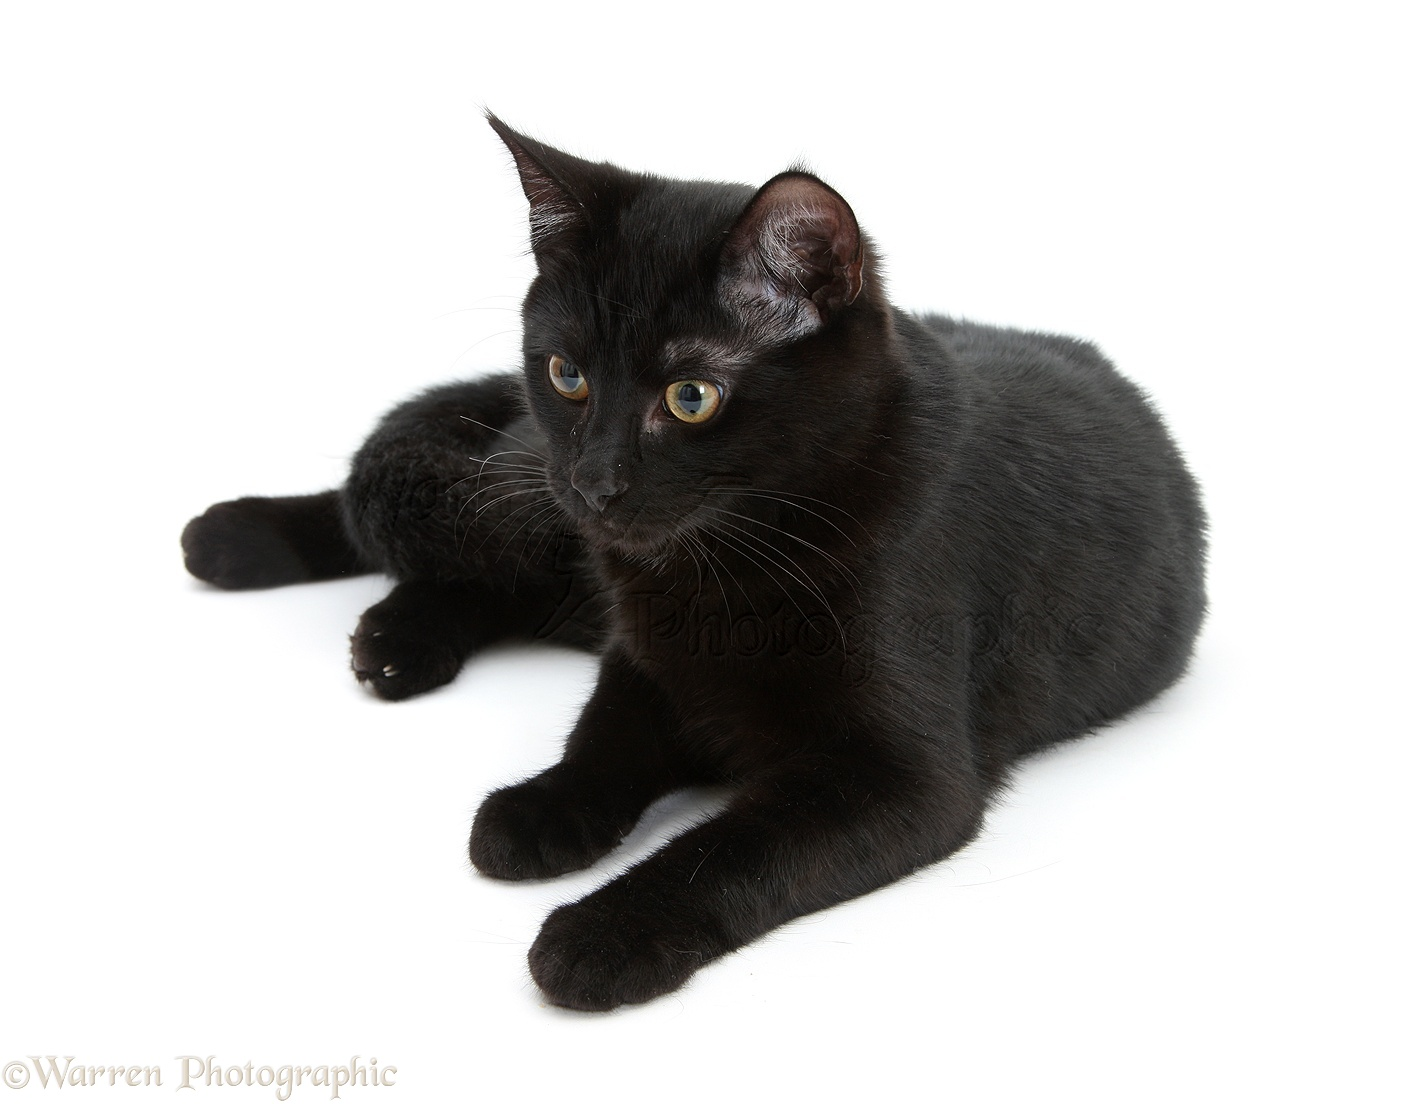 Black cat photo WP